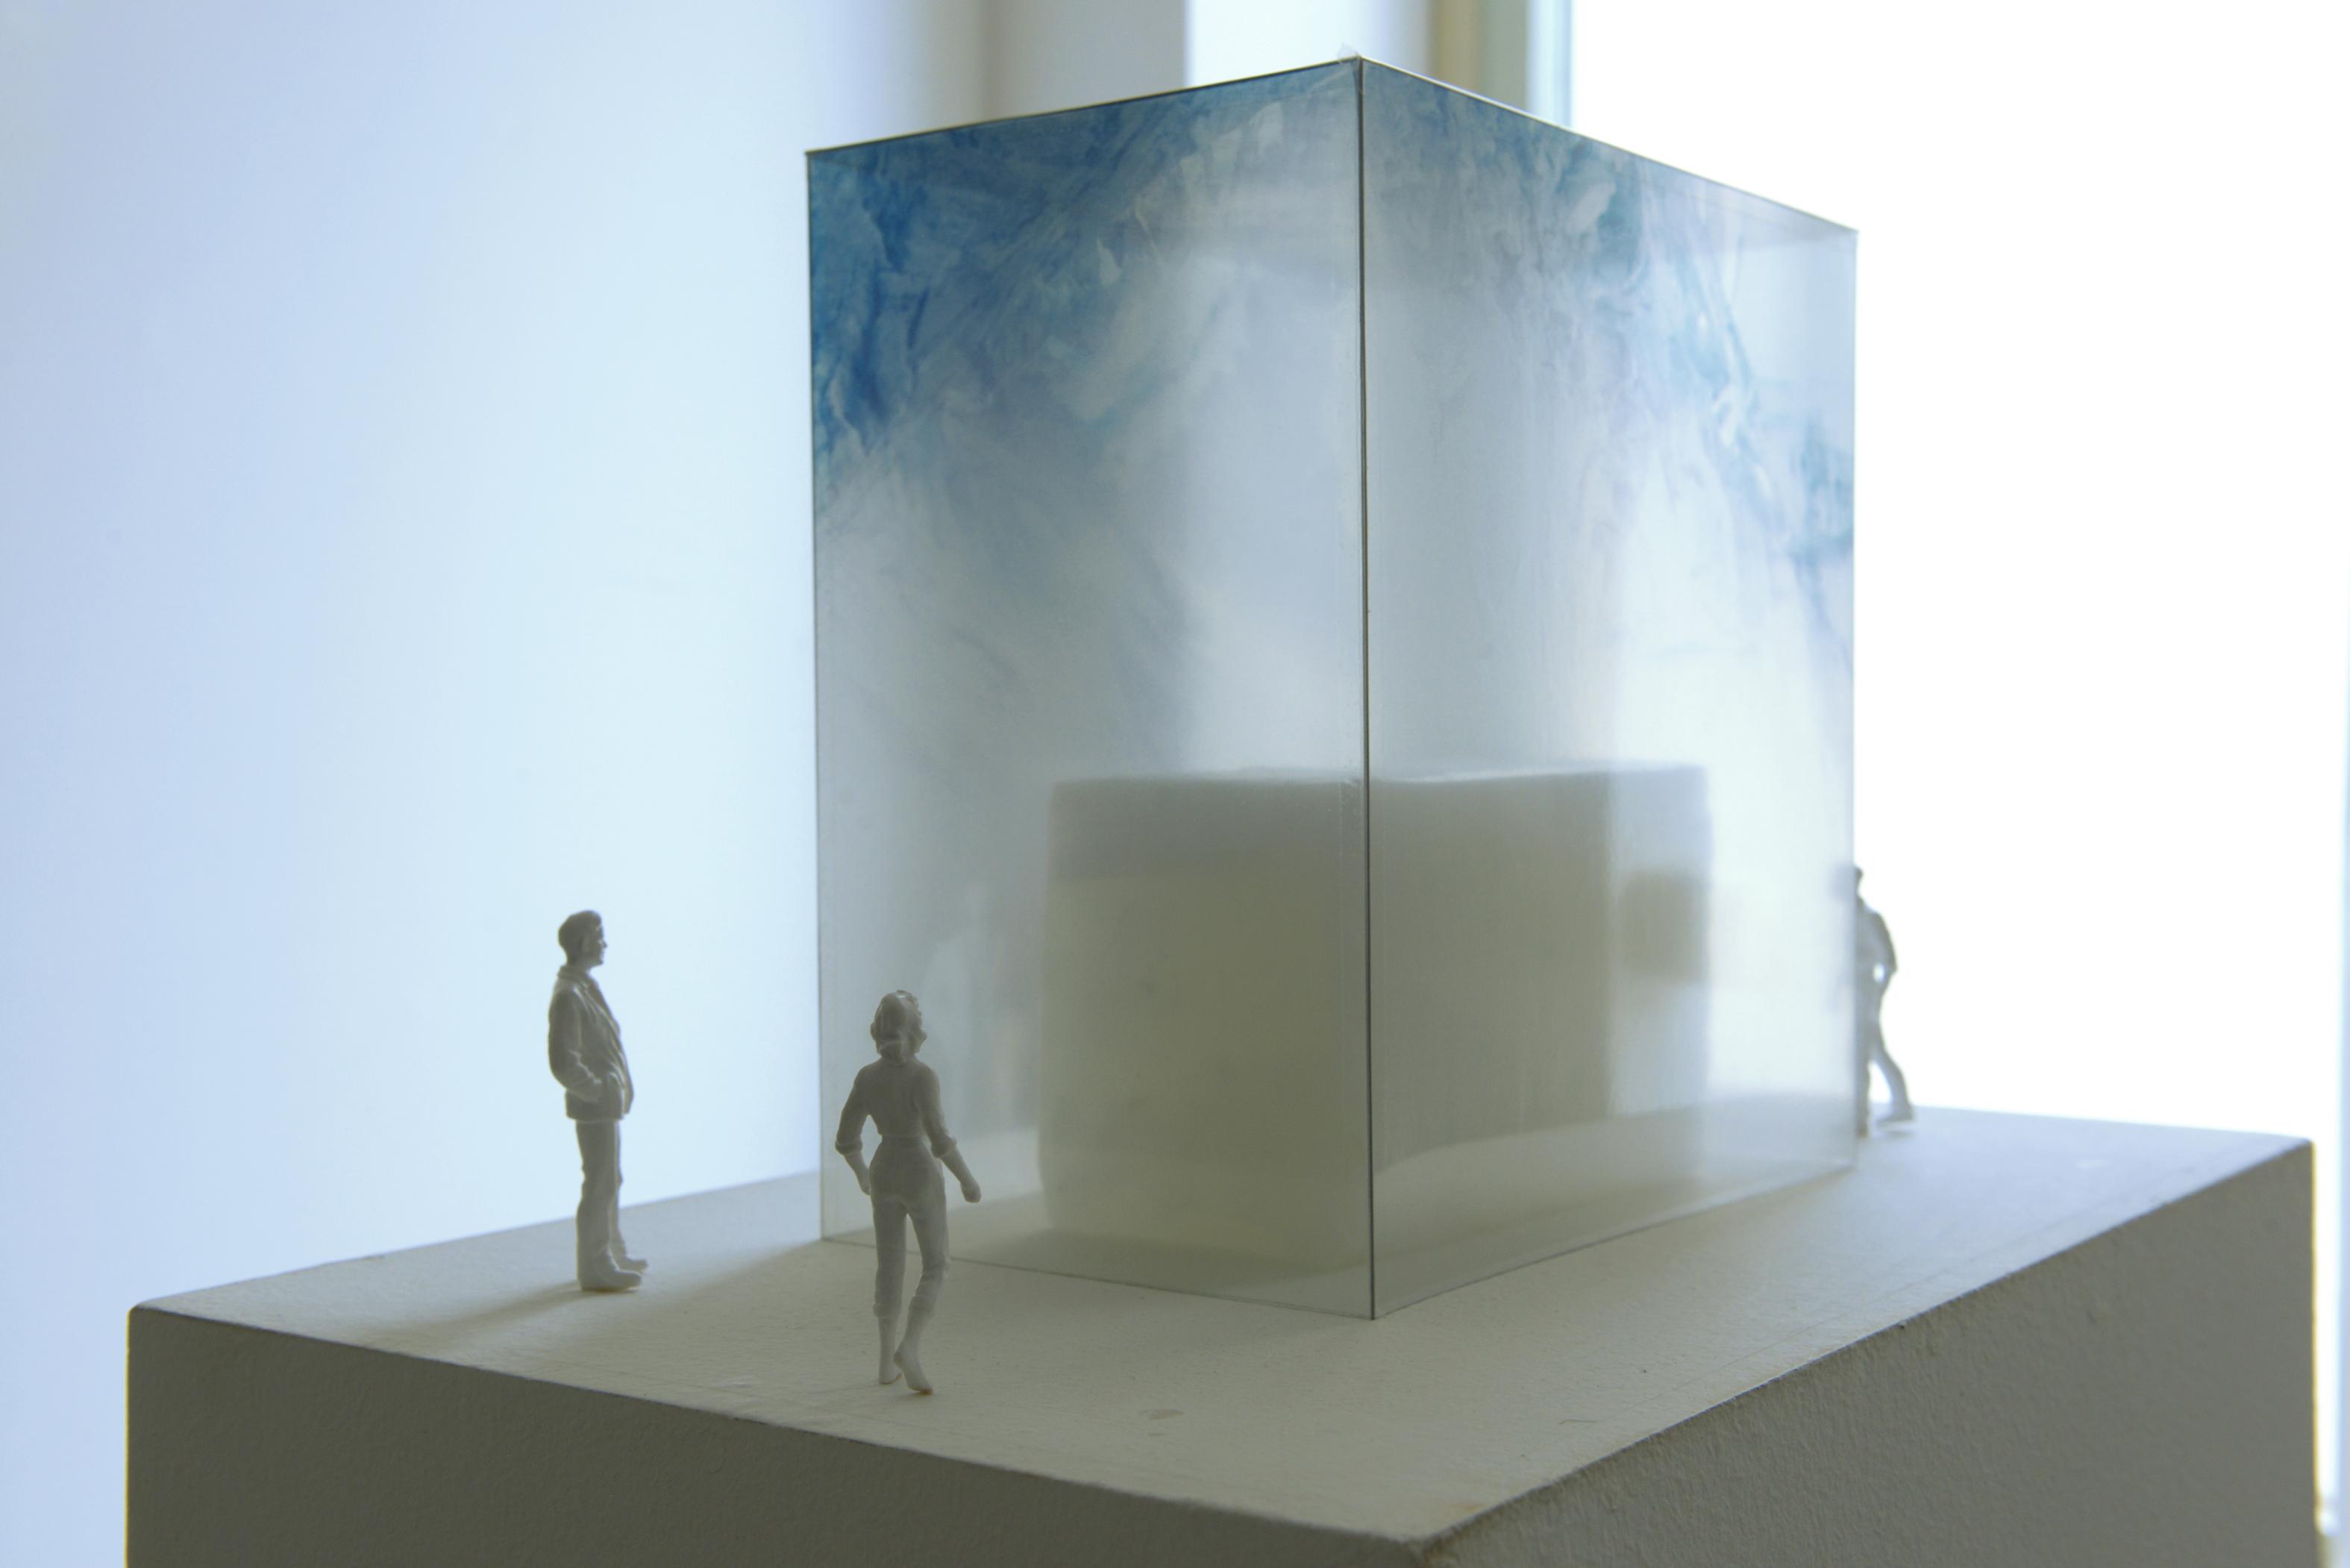 Die Festung IV, 2015 (Modell)